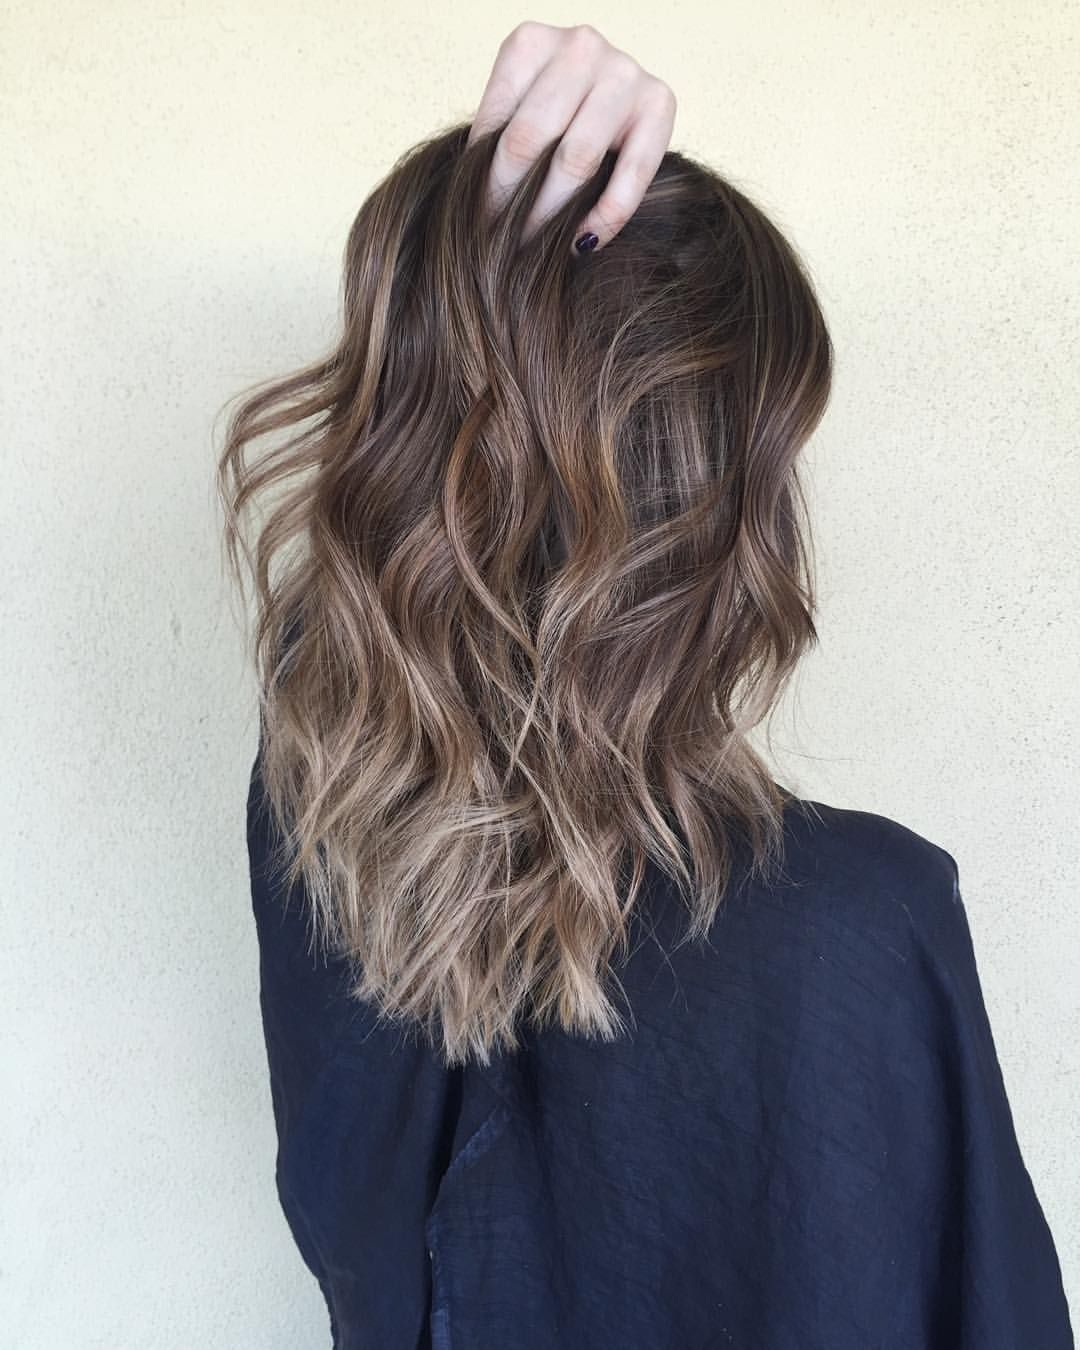 Bradi burch på instagram uclovinu this sombre habitsalonud hair